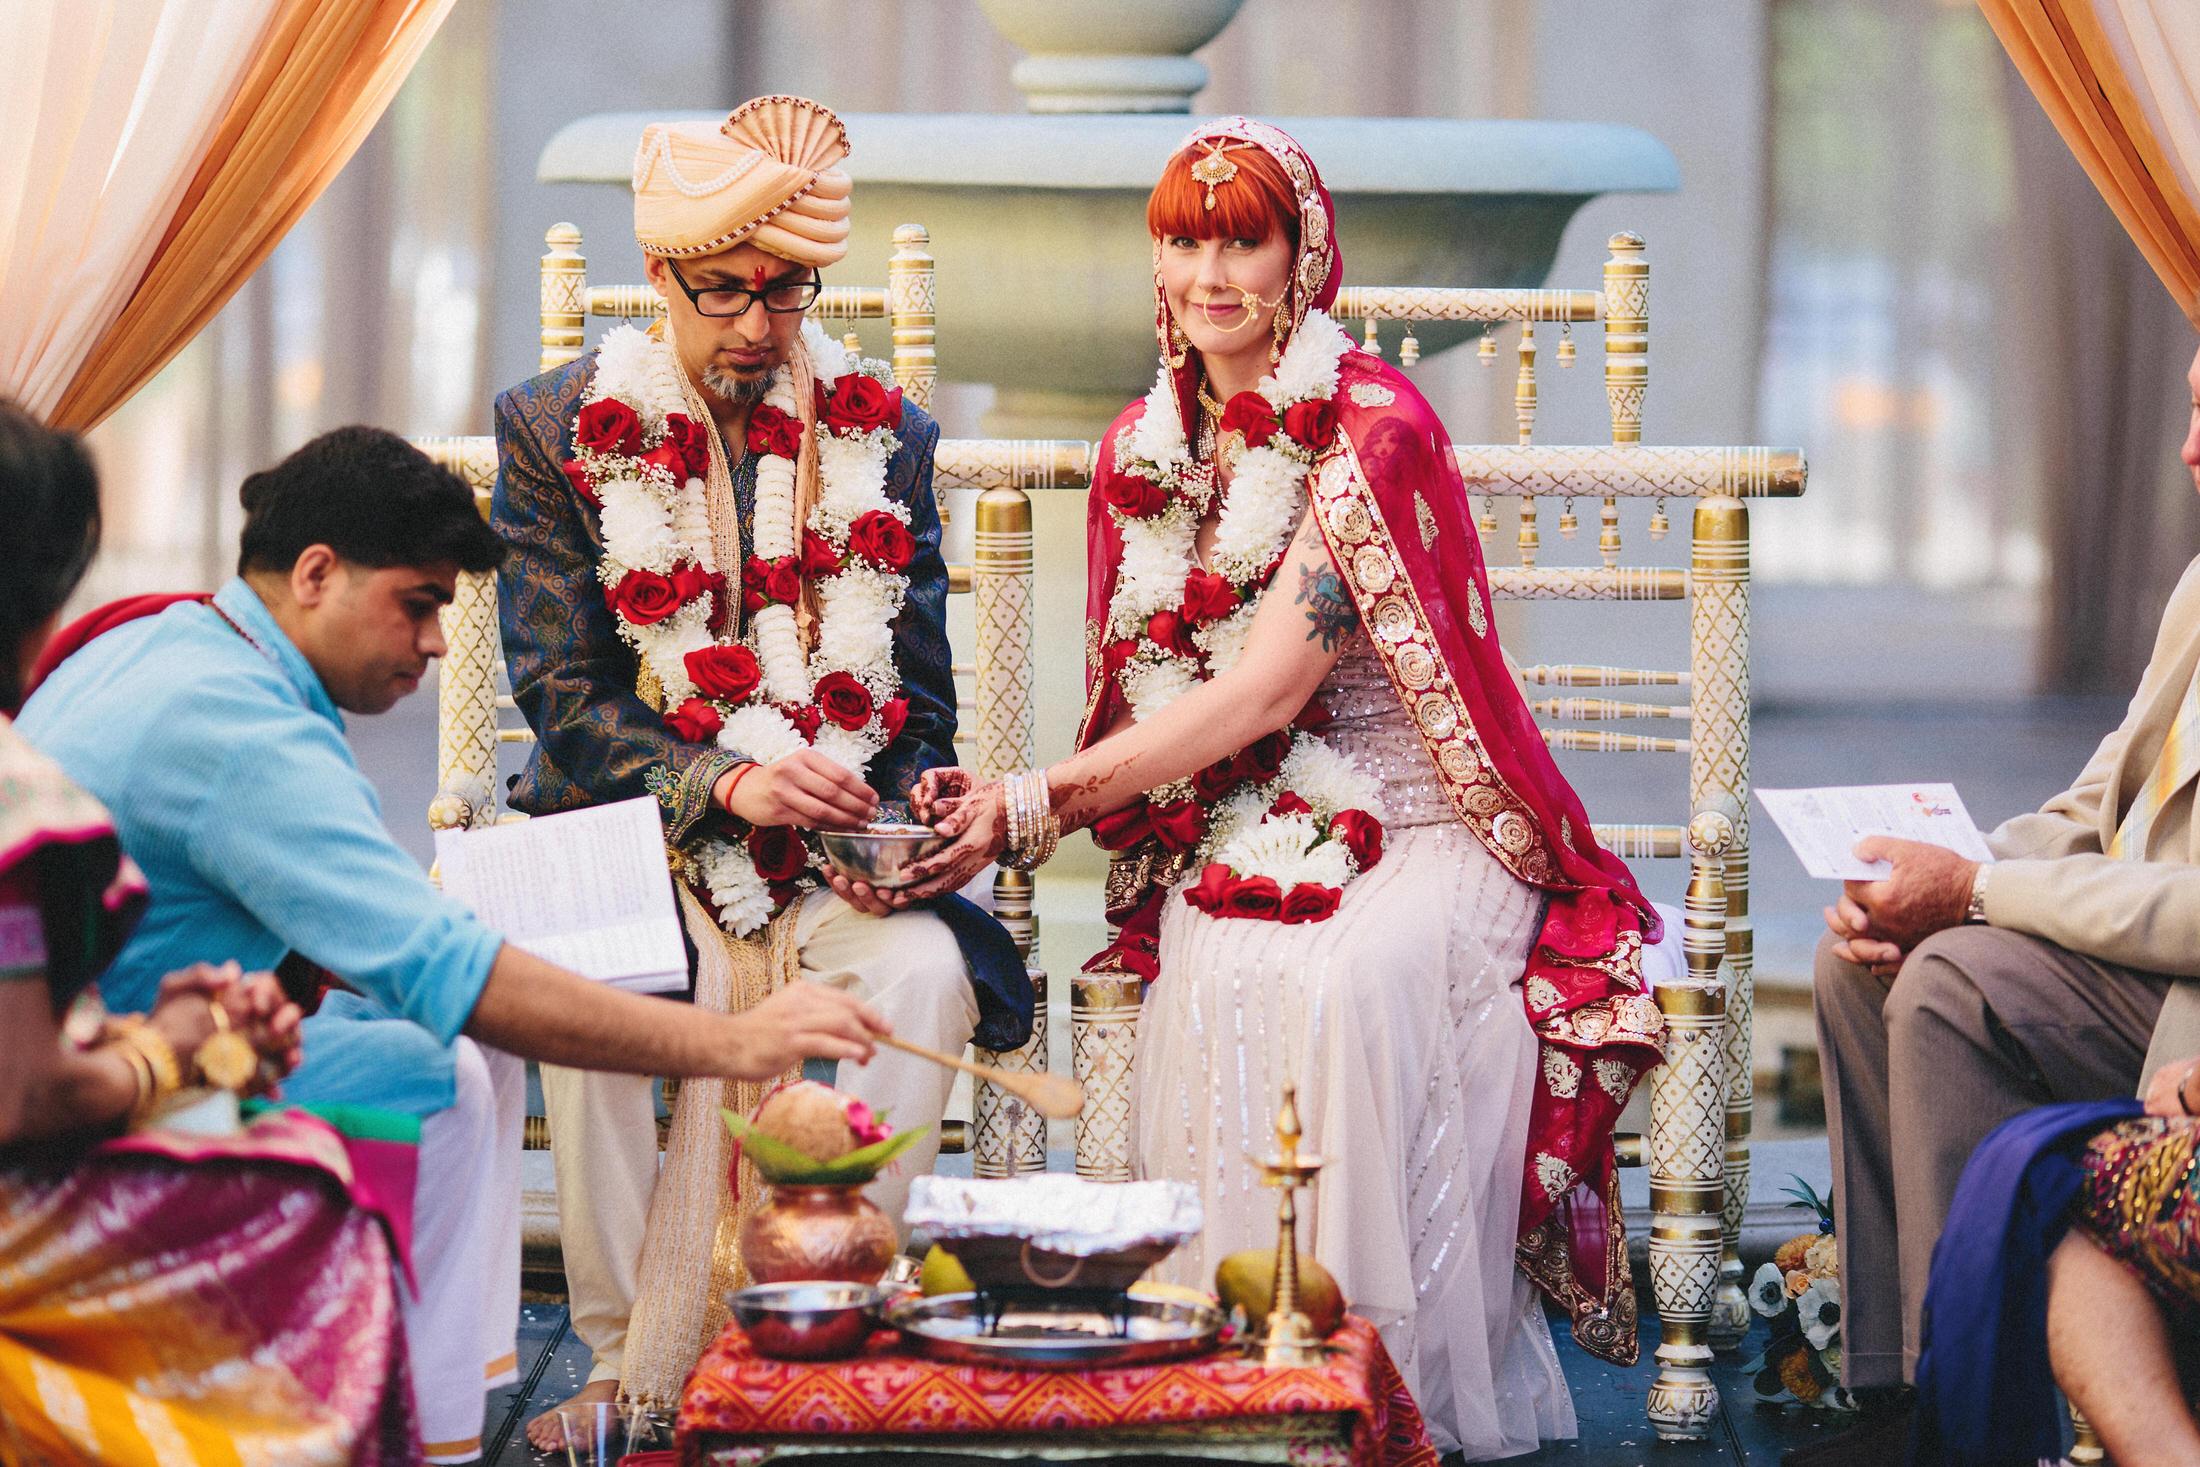 Modern-Indian-Serra-Plaza-wedding-063.jpg